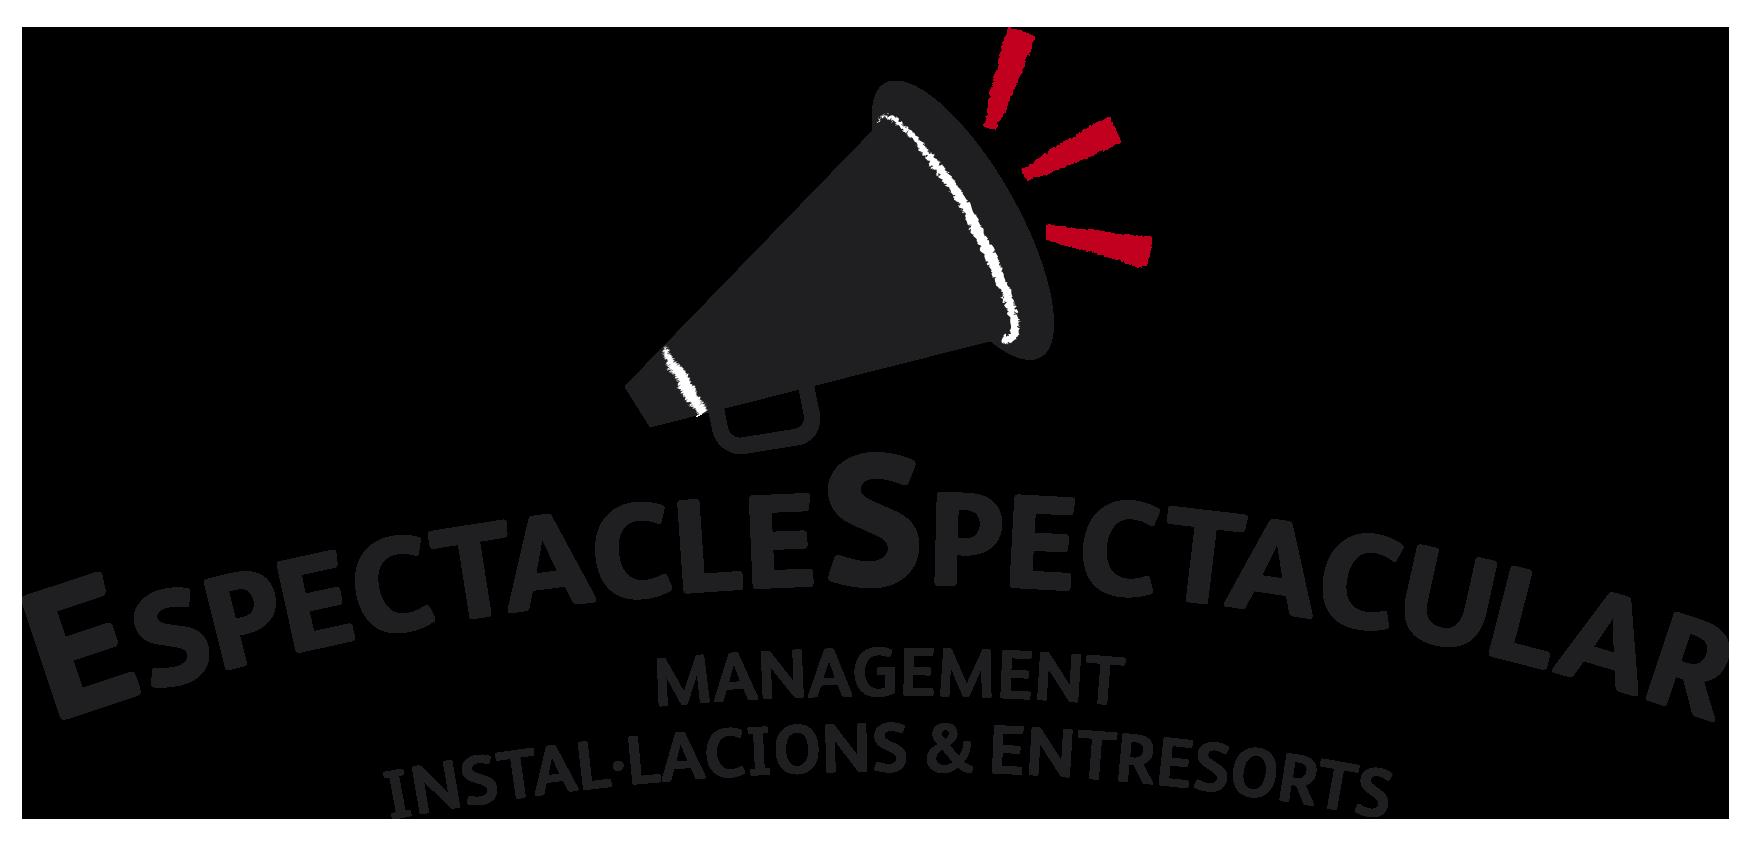 logo espectaclespectacular